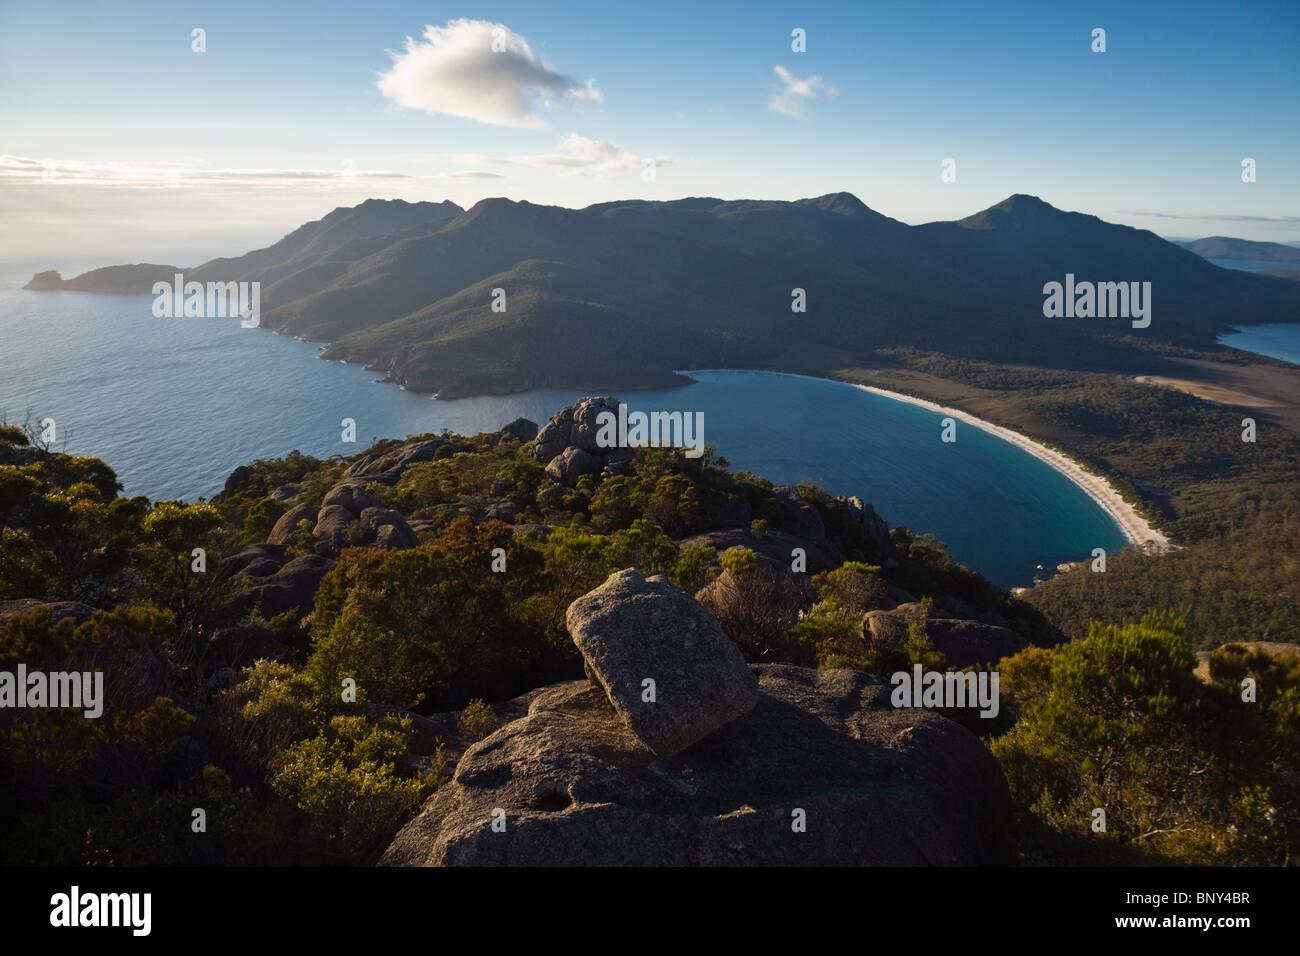 Sunrise view of Wineglass Bay from Mt Amos. Freycinet National Park, Tasmania, AUSTRALIA. - Stock Image